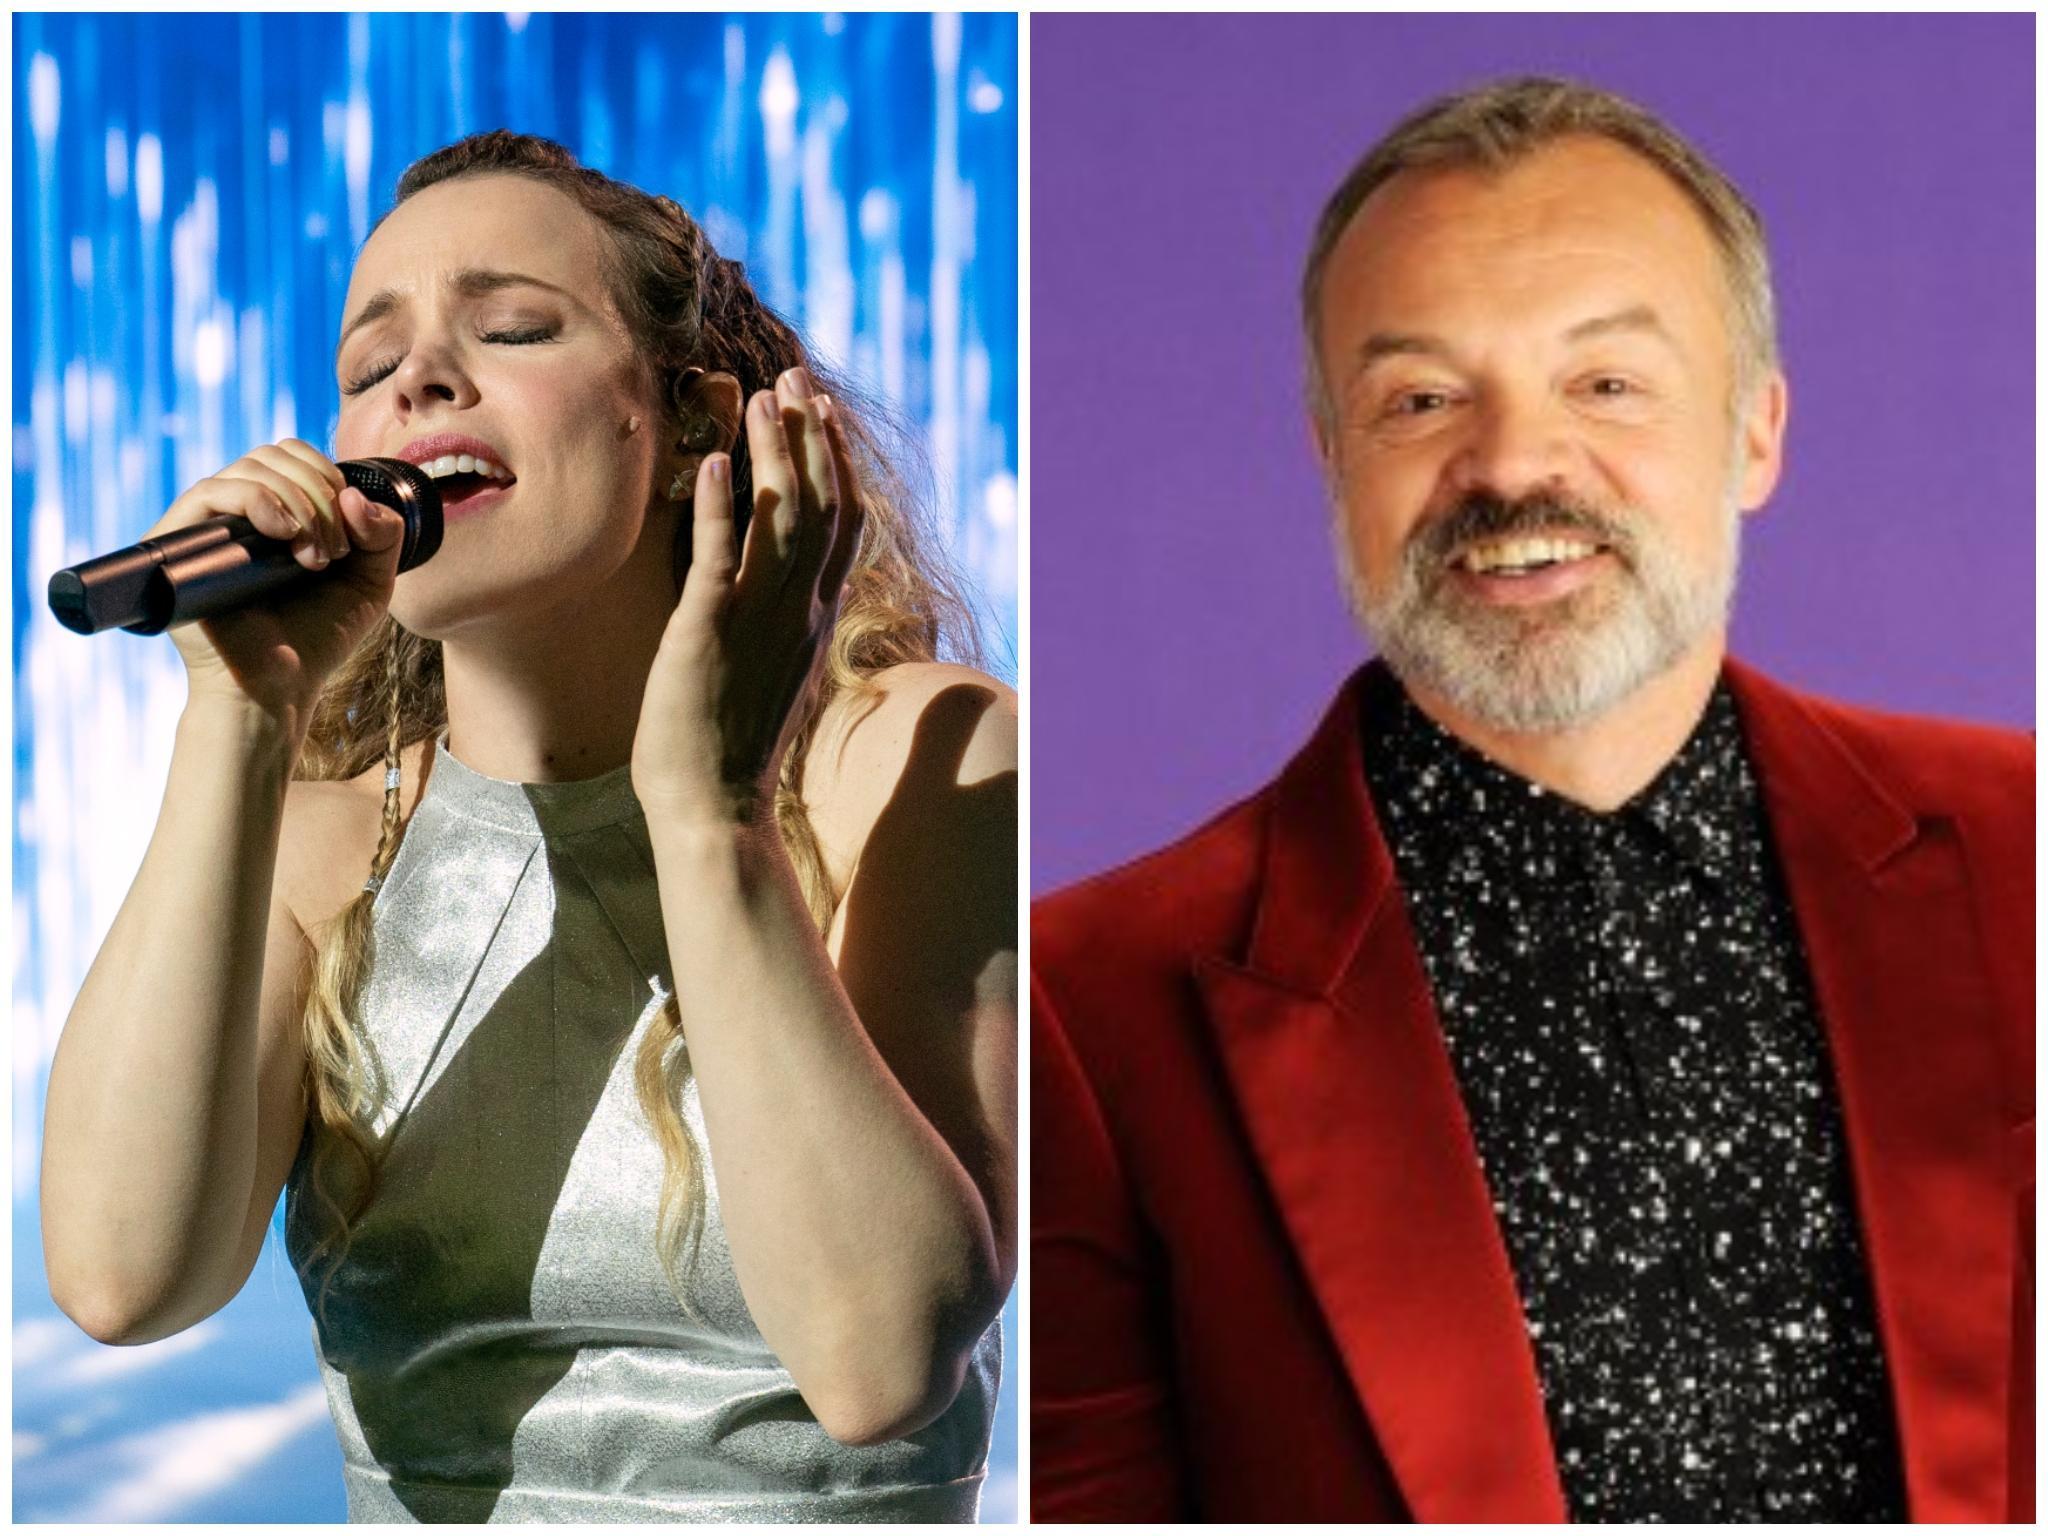 rachel-mcadams-graham-norton-eurovision